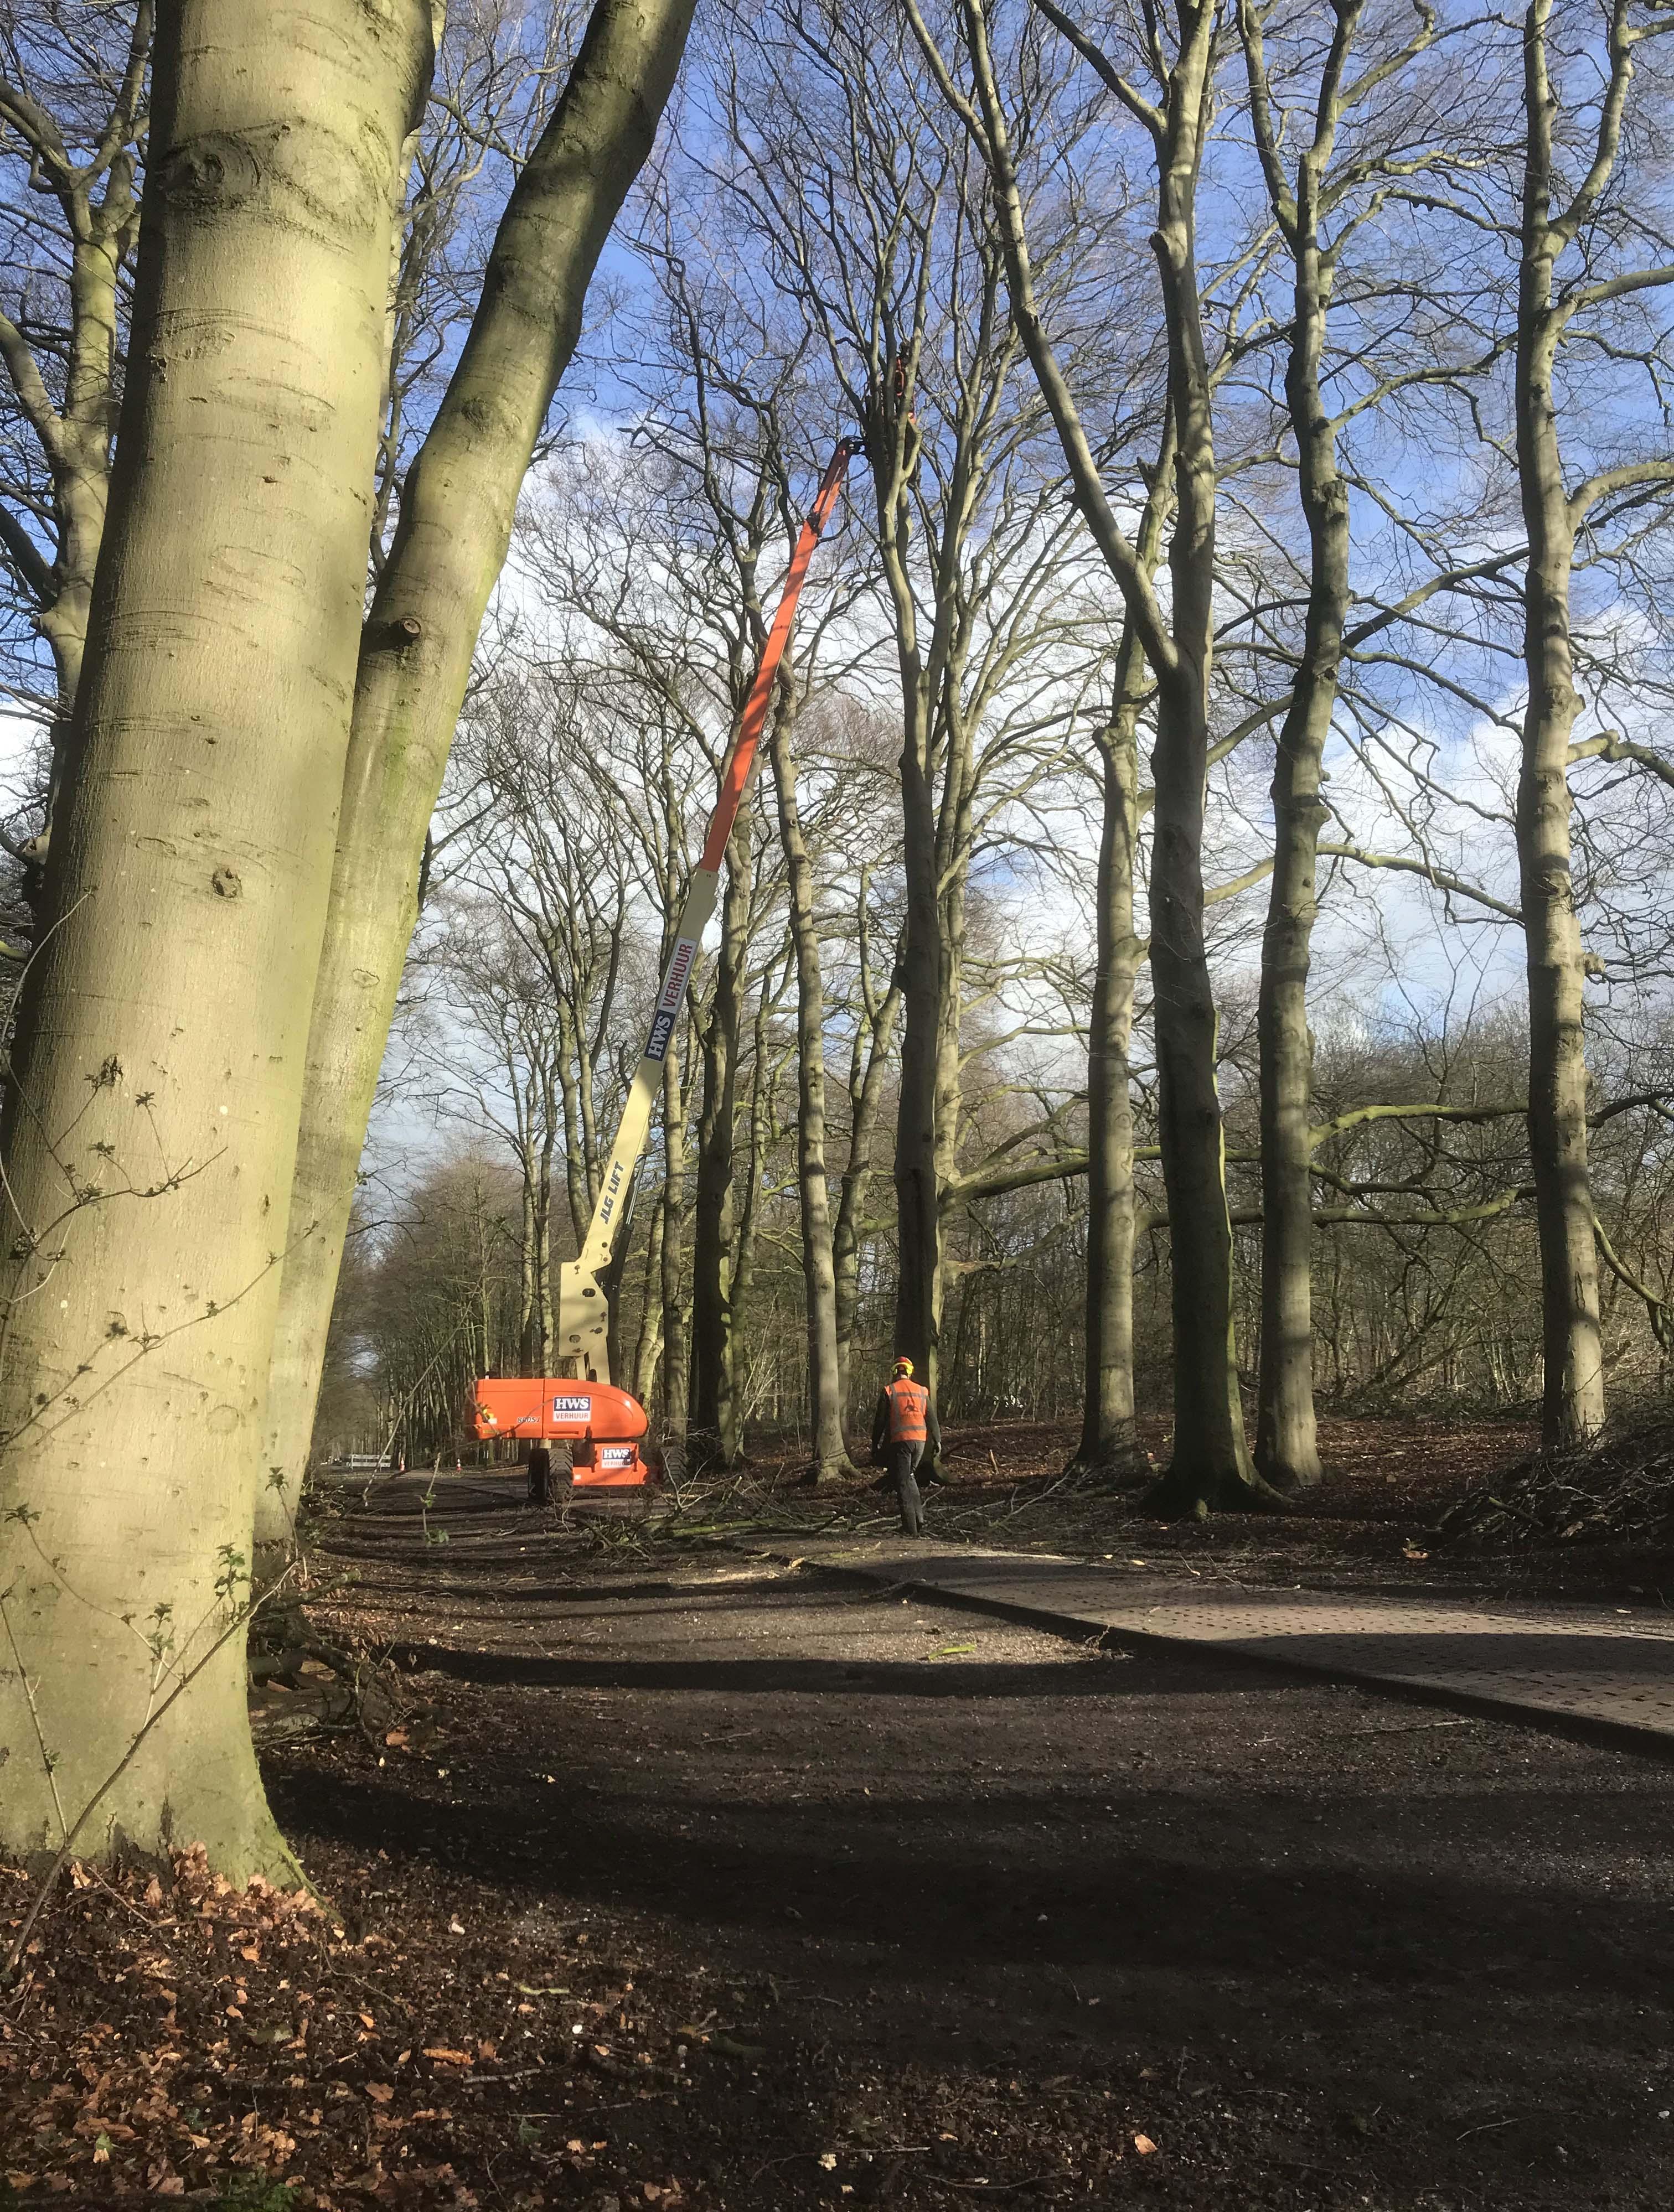 Hoefakker boomspecialisten snoeien monumentale beuken Geldersch Landschap (9m)